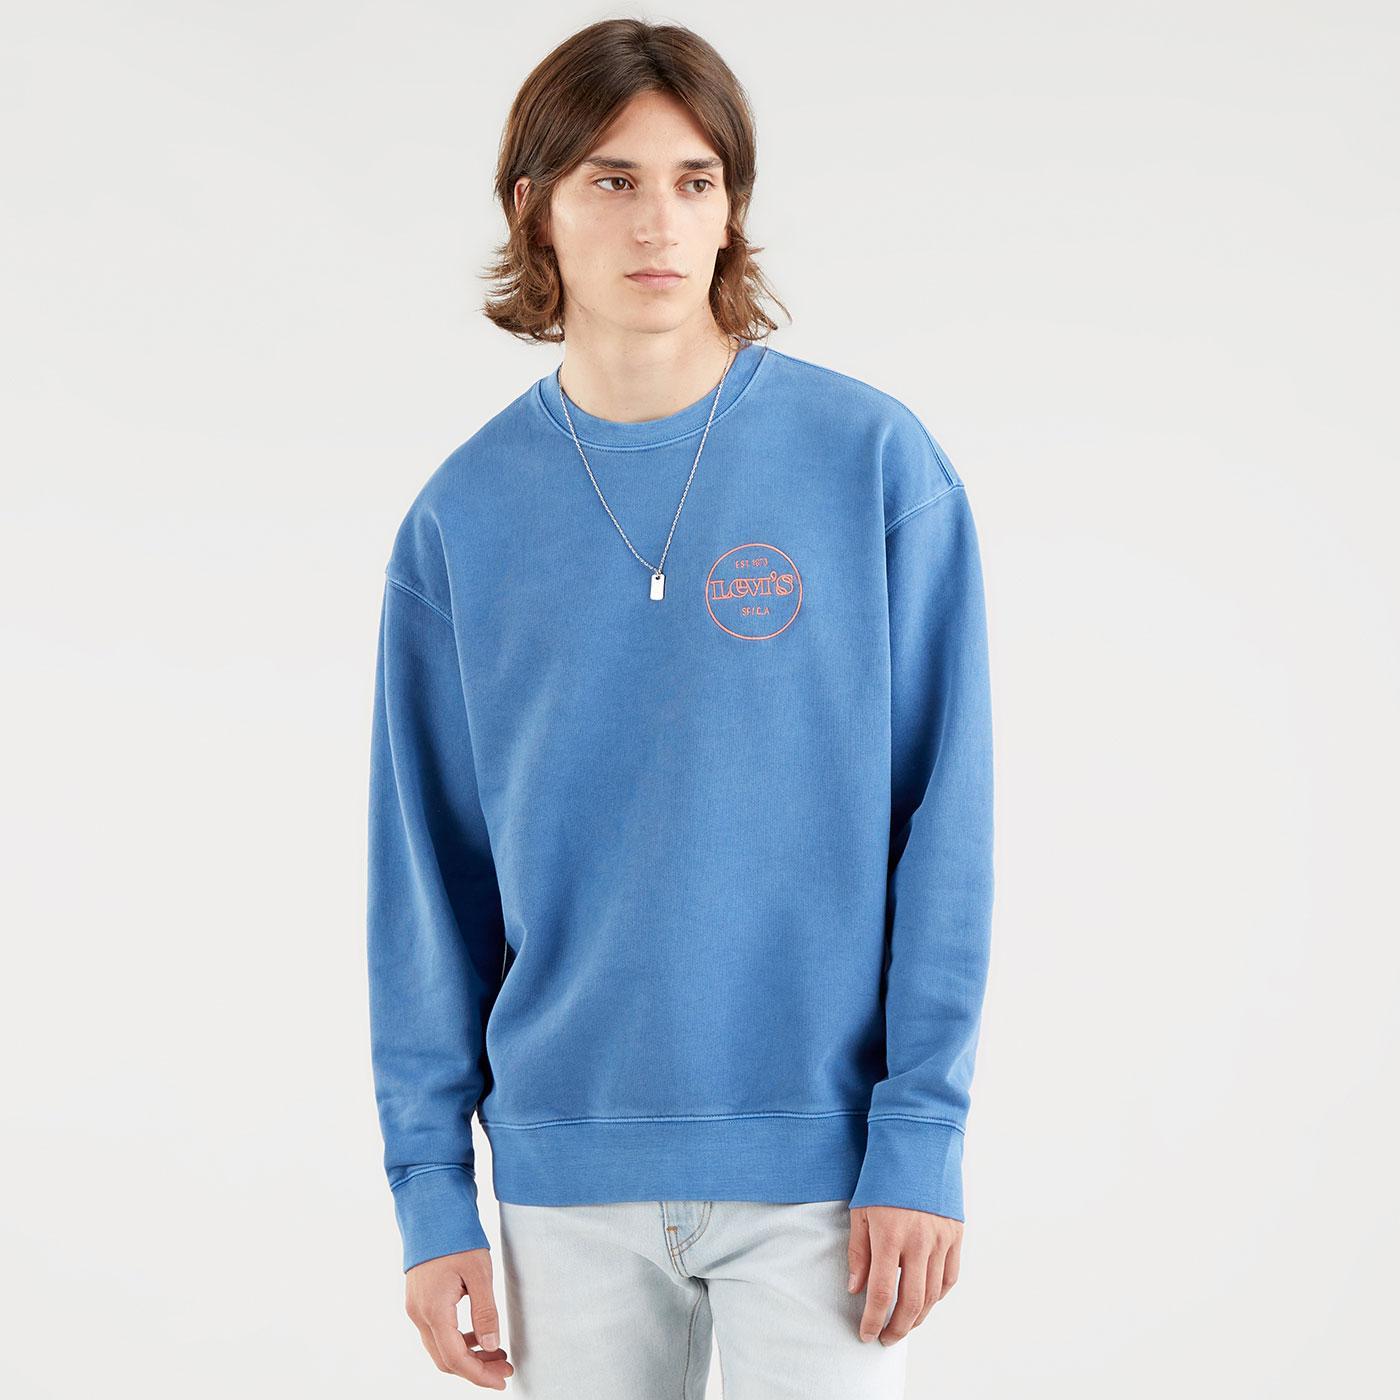 LEVI'S Relaxed T2 Graphic Crew Sweatshirt (SSB)